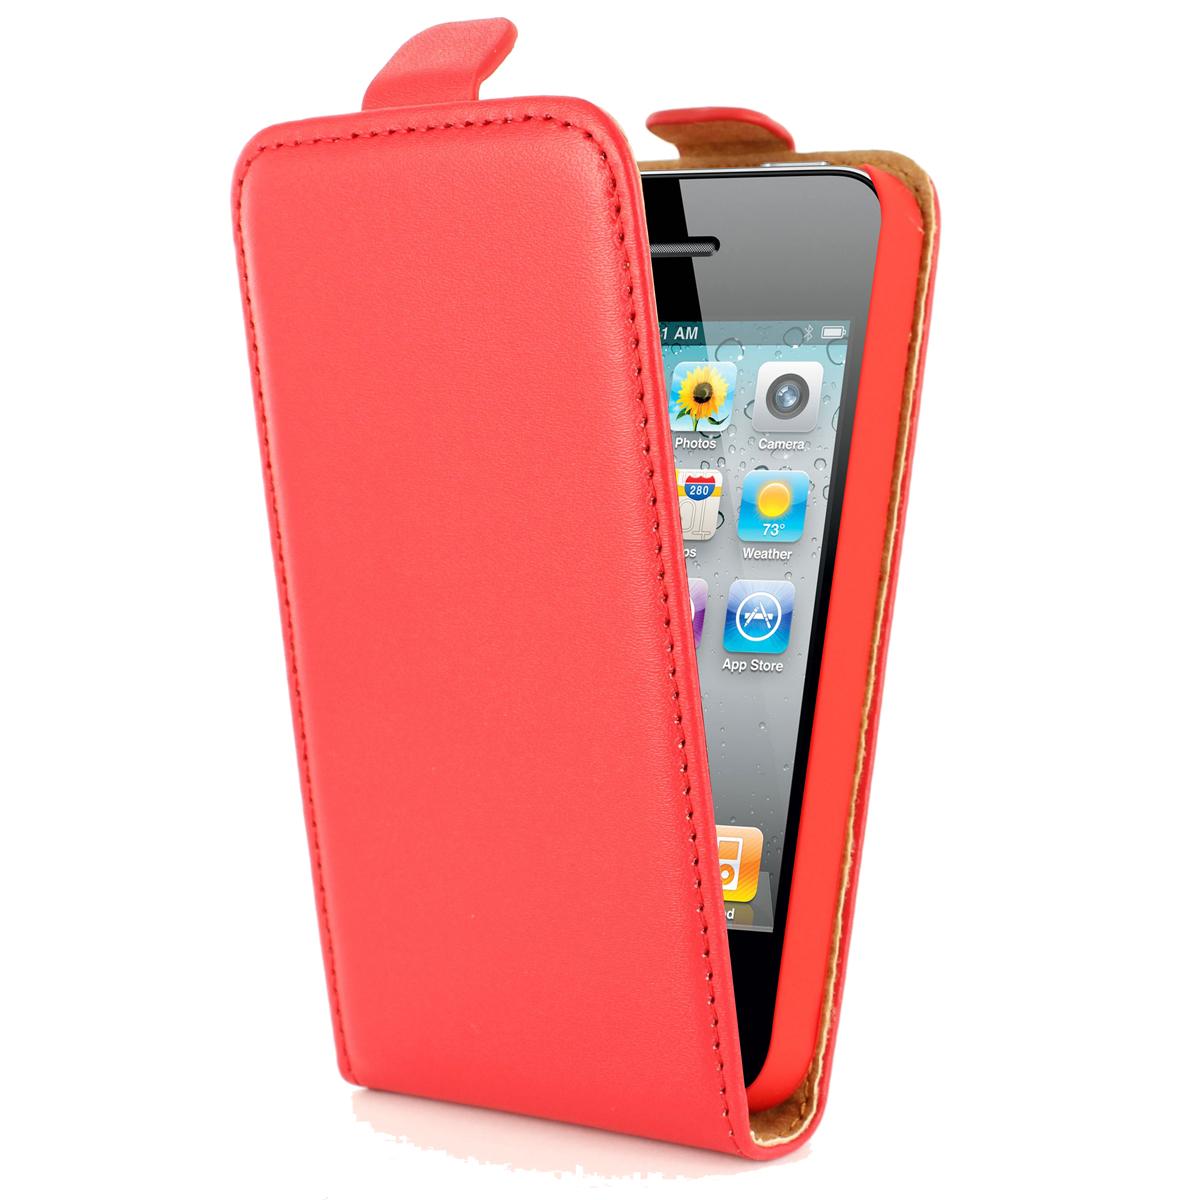 Etui téléphone Swiss Charger Etui Cuir Flip Rouge pour iPhone 4/4S Etui en cuir pour iPhone 4/4S